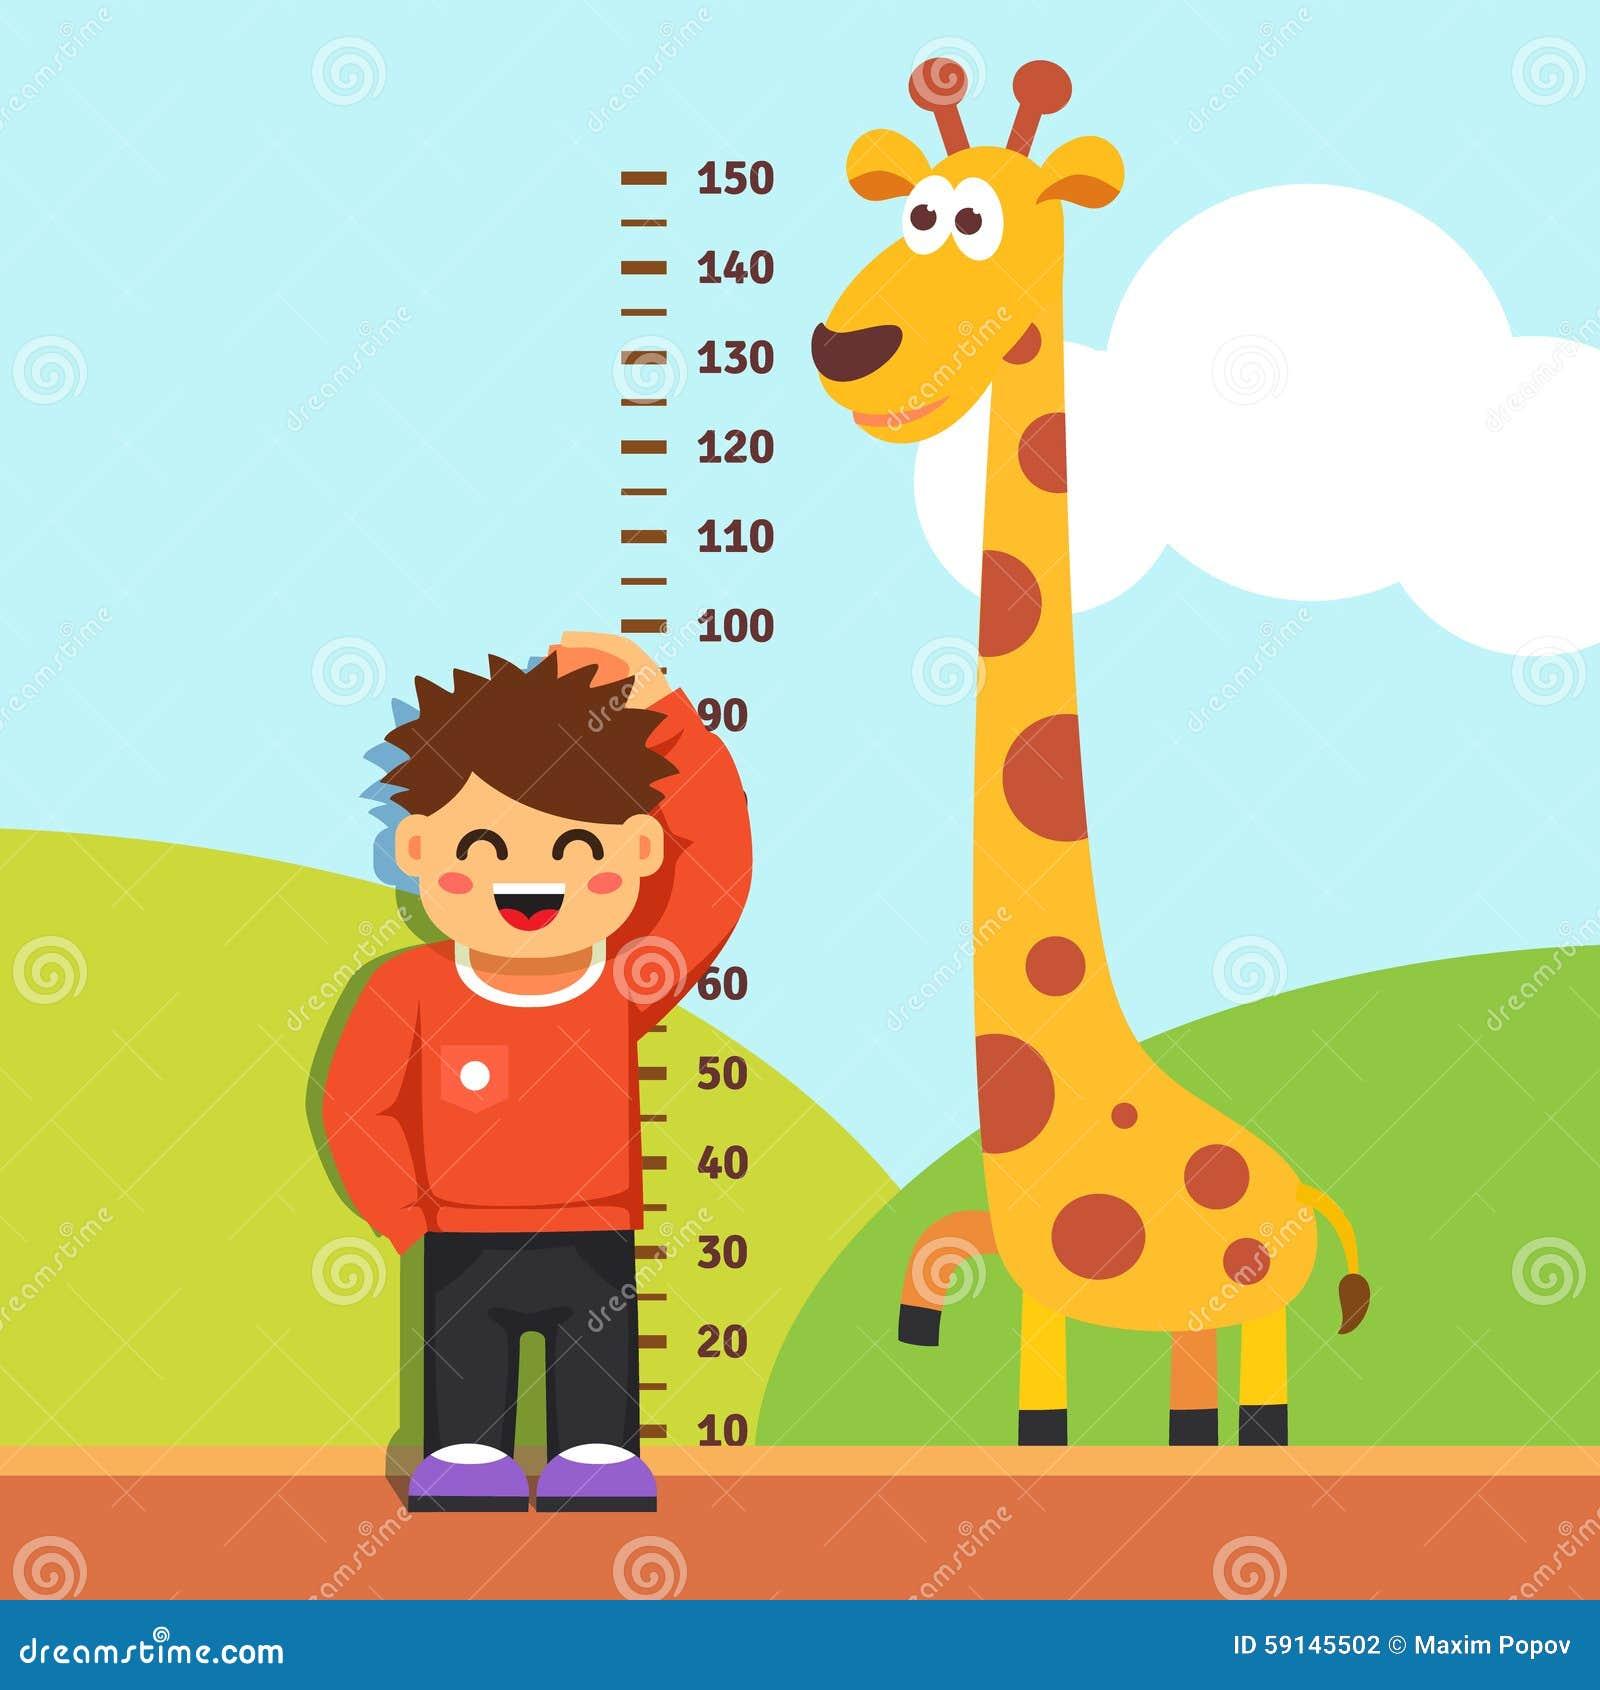 boy kid measuring his height at kindergarten wall stock reindeer clip art black and white reindeer clipart free